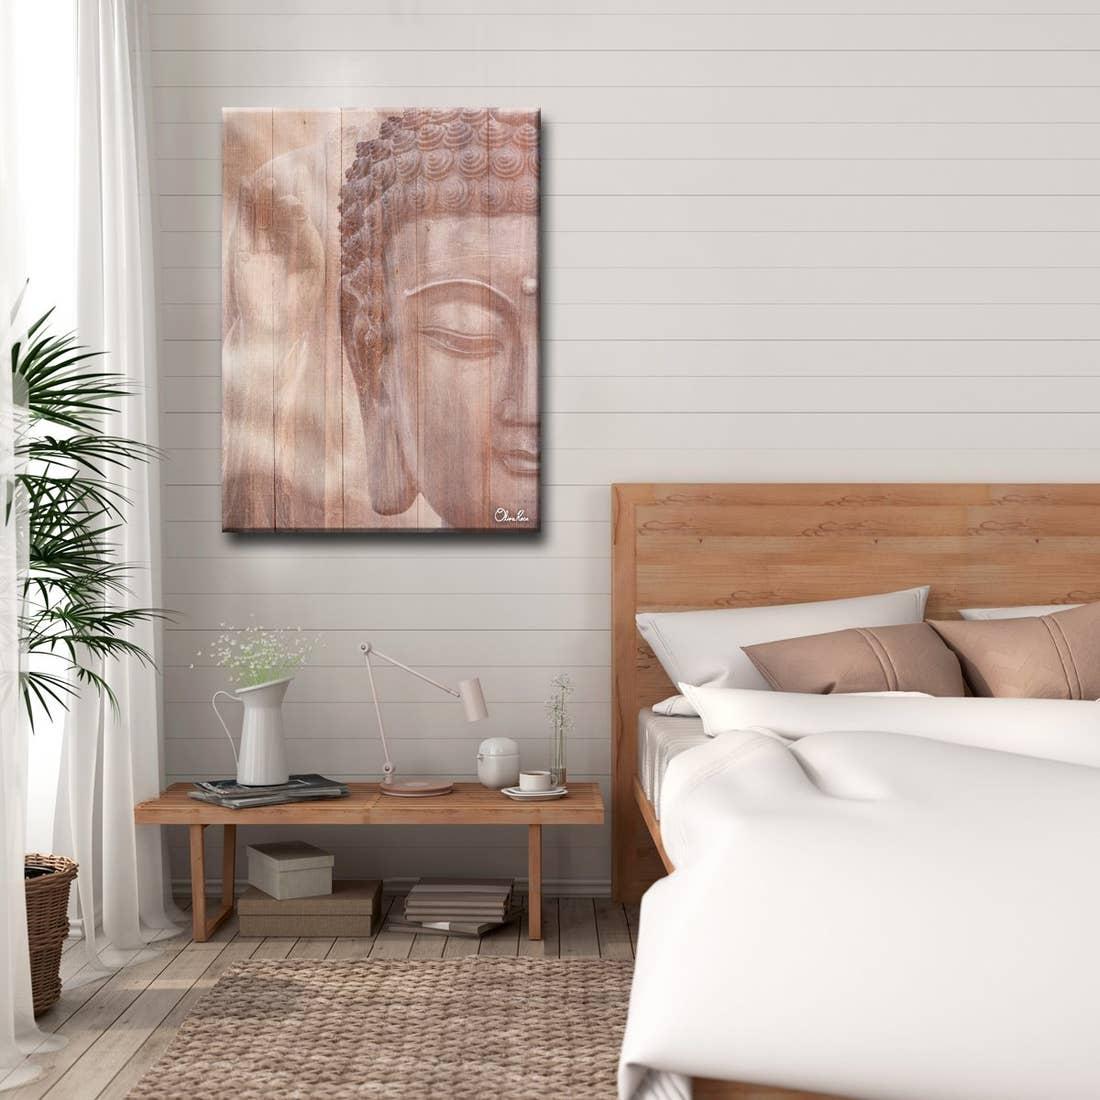 'Buddha' Inspirational Canvas Art by Oli